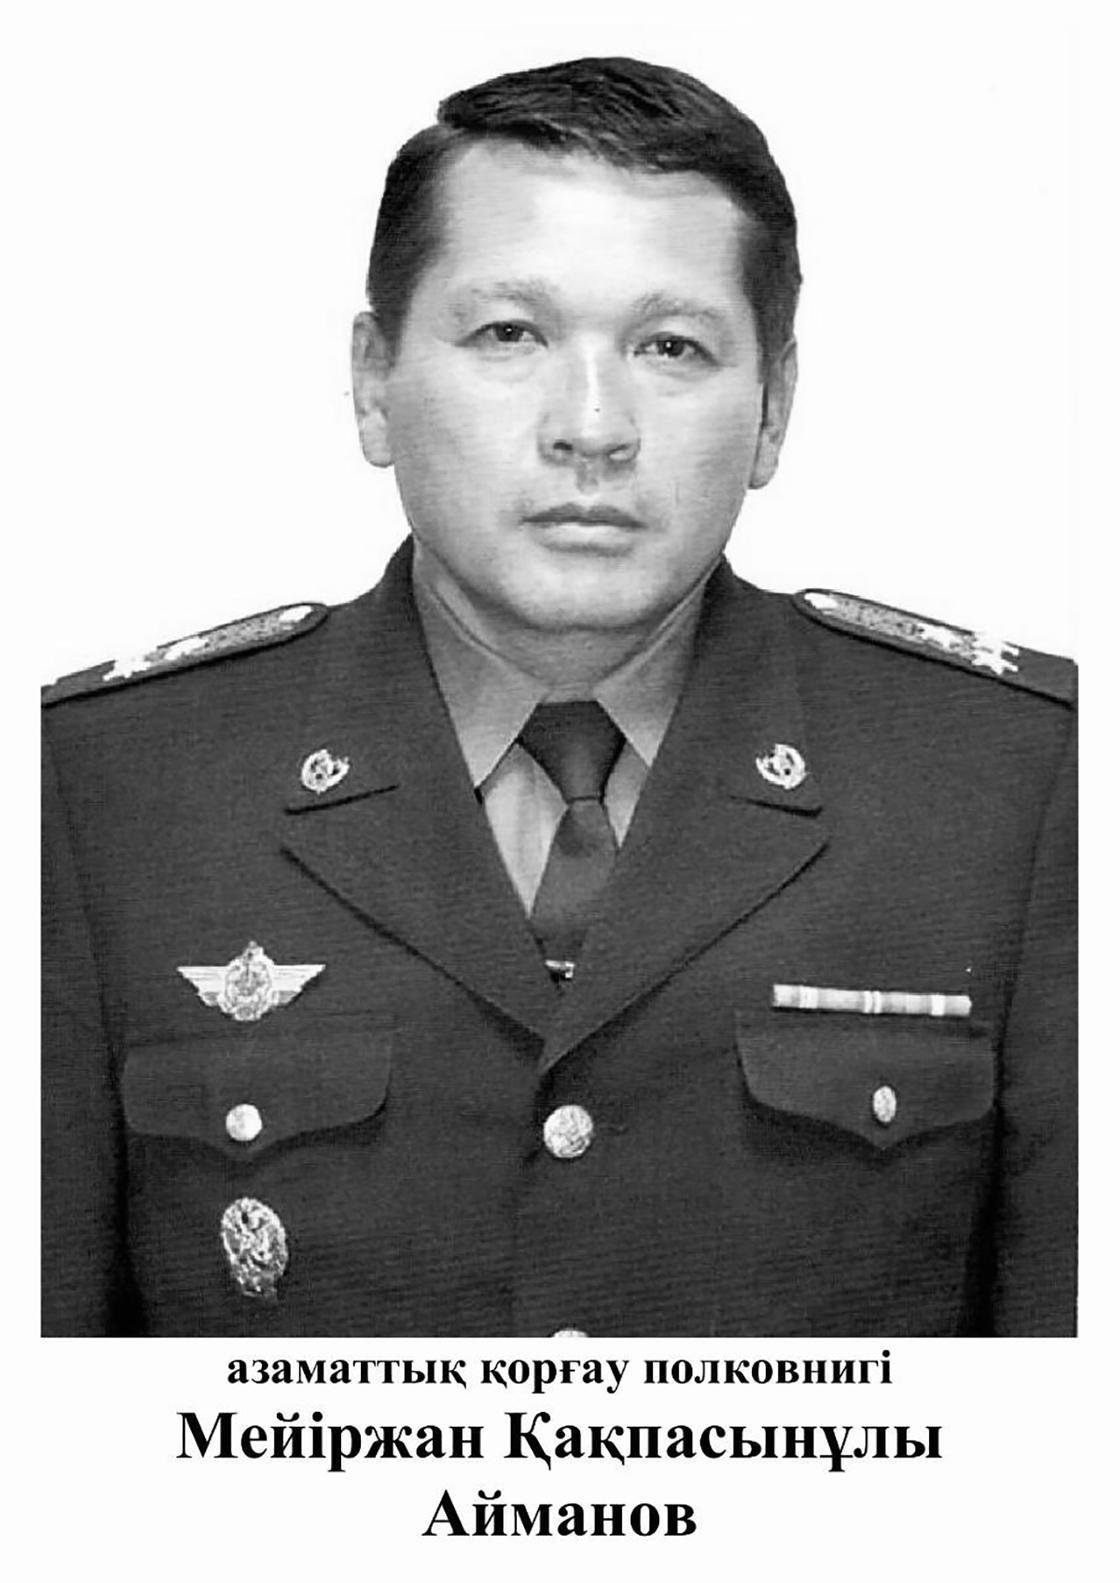 Меиржан Айманов